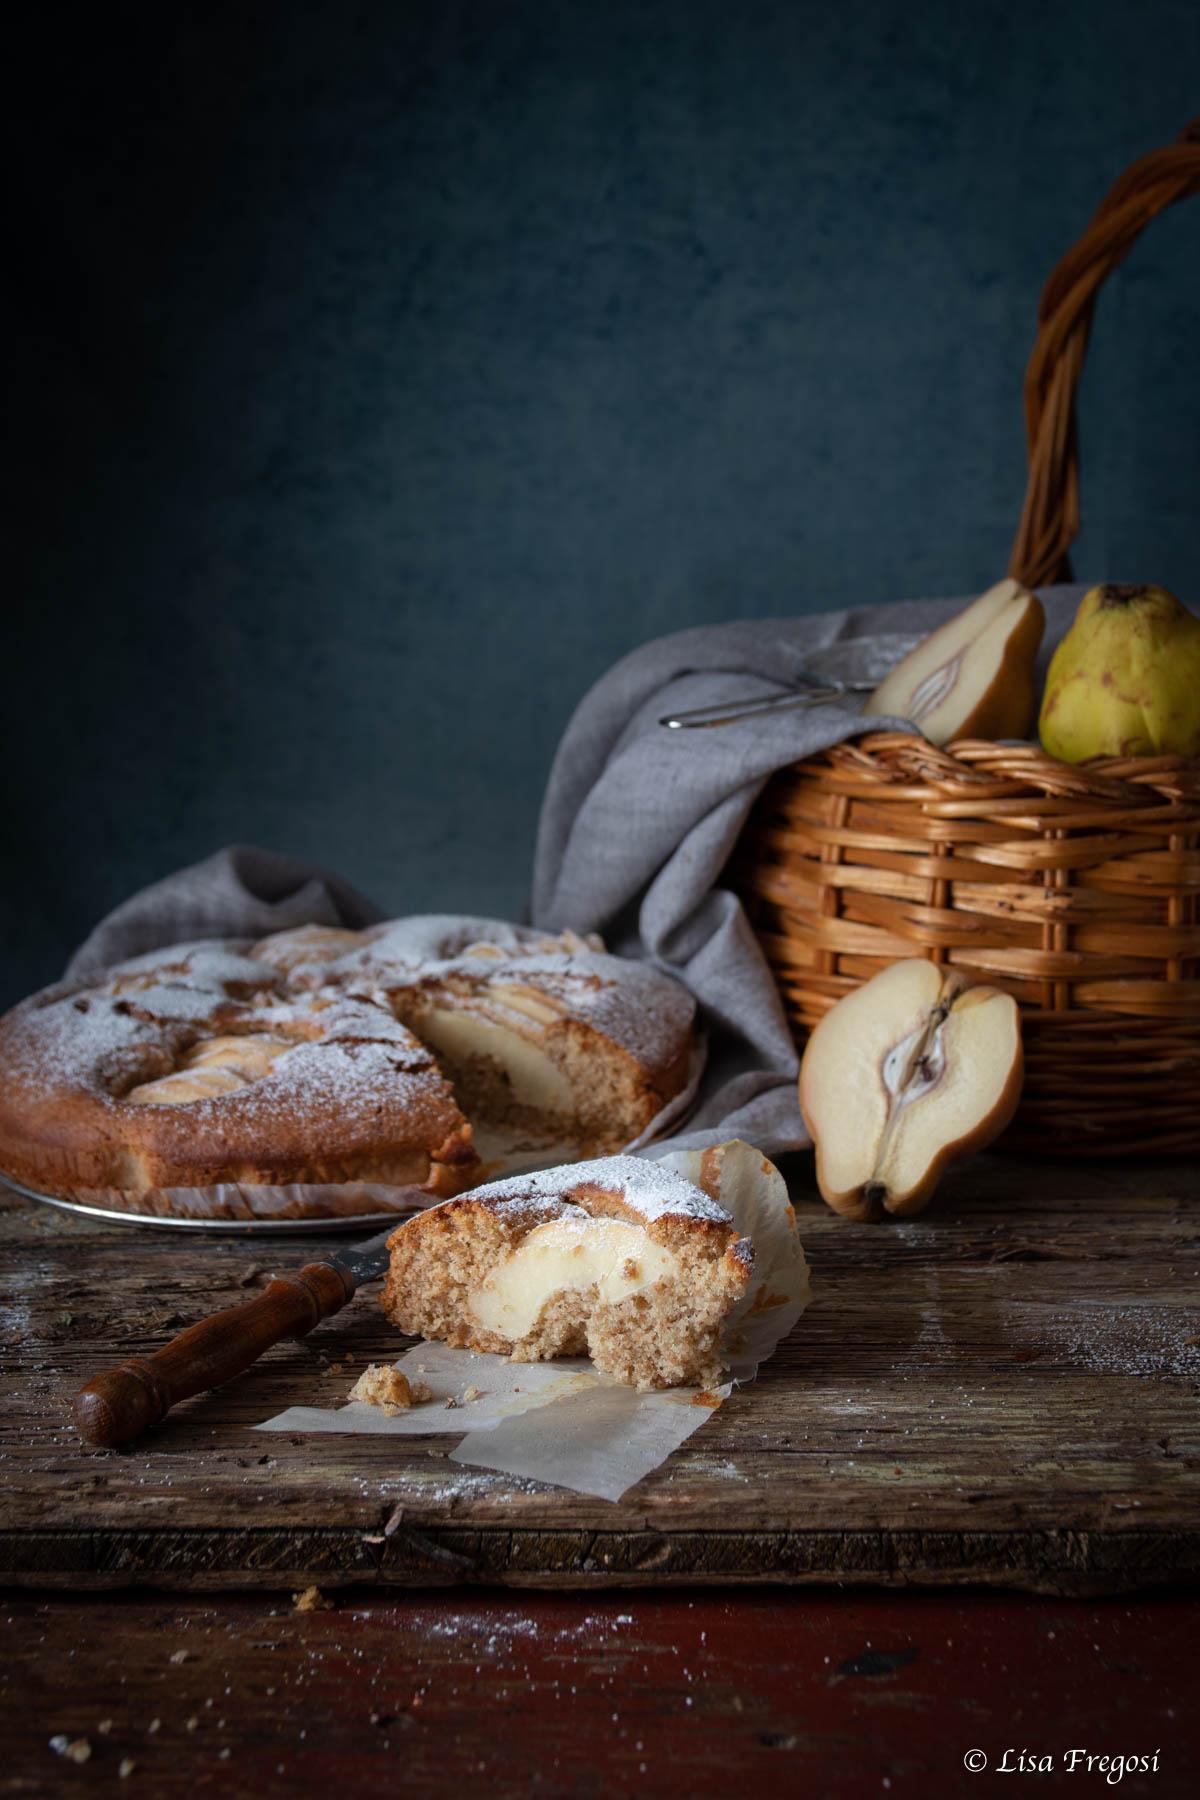 torta di mele cotogne ricetta torta con mele cotogne ricette torta di mele cotogne senza burro